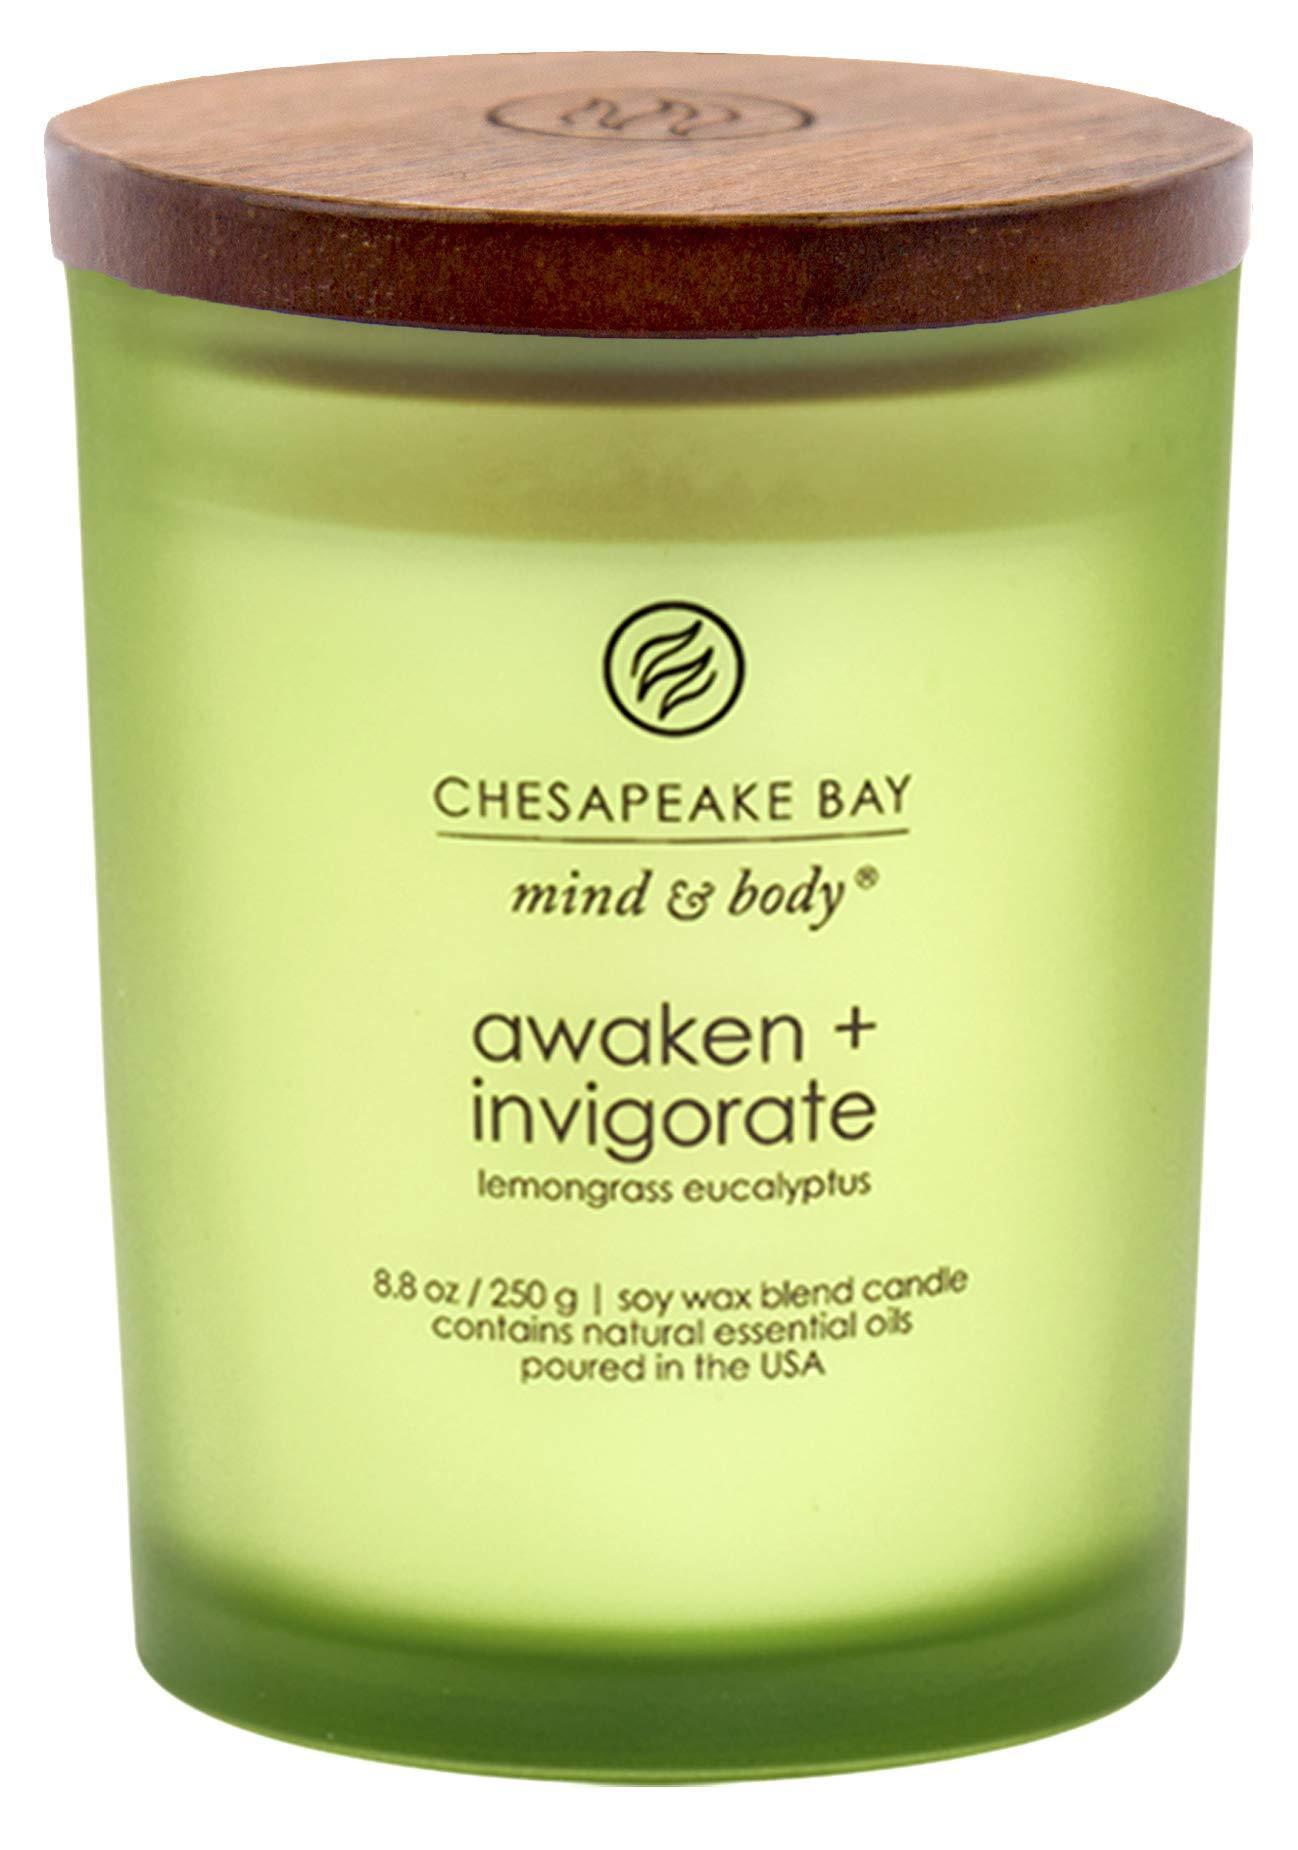 Chesapeake Bay Candle Scented Candle, Awaken + Invigorate ...